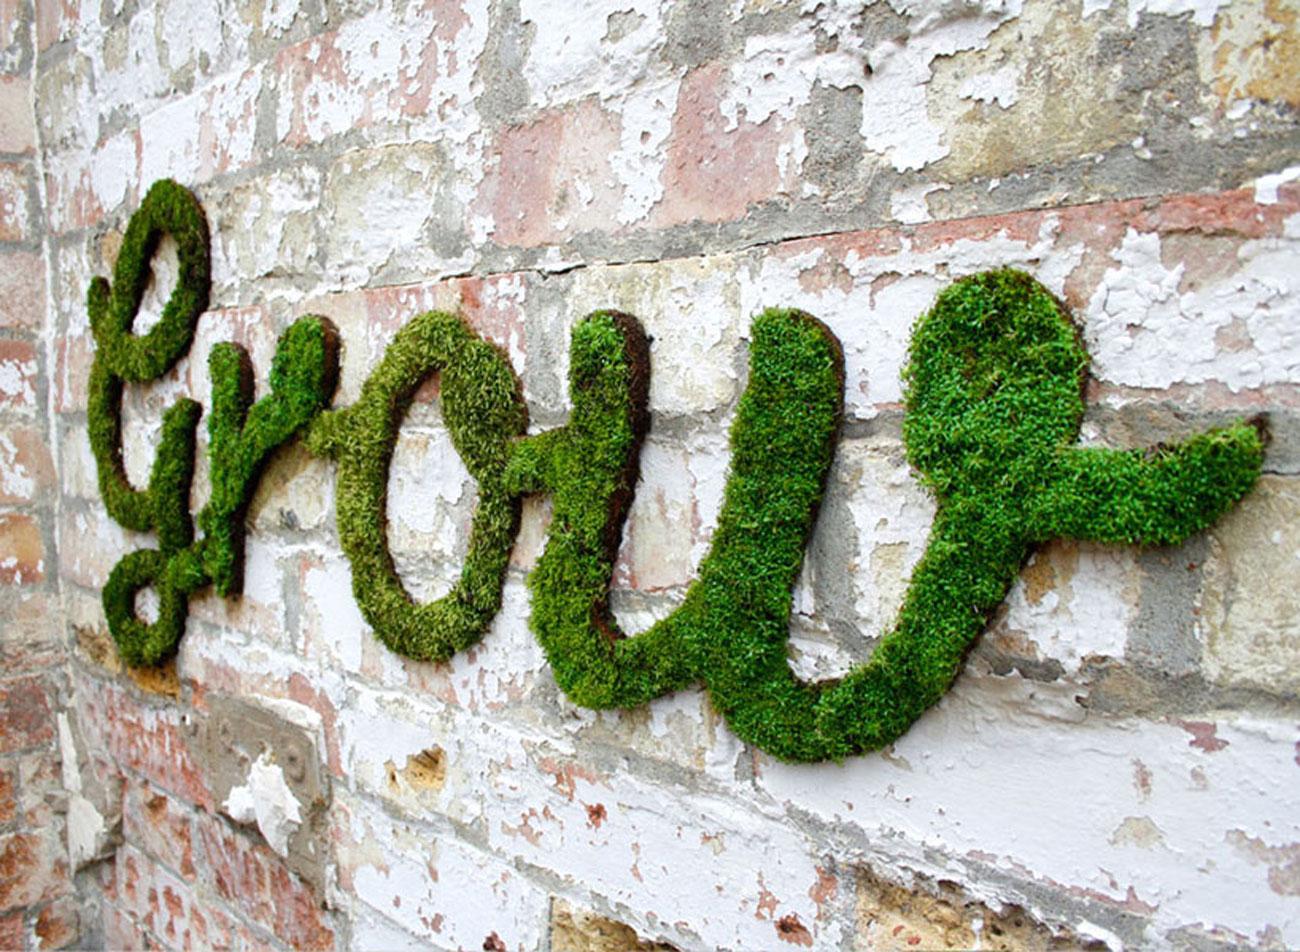 anna-garforth-moss-graffiti-designboom-051